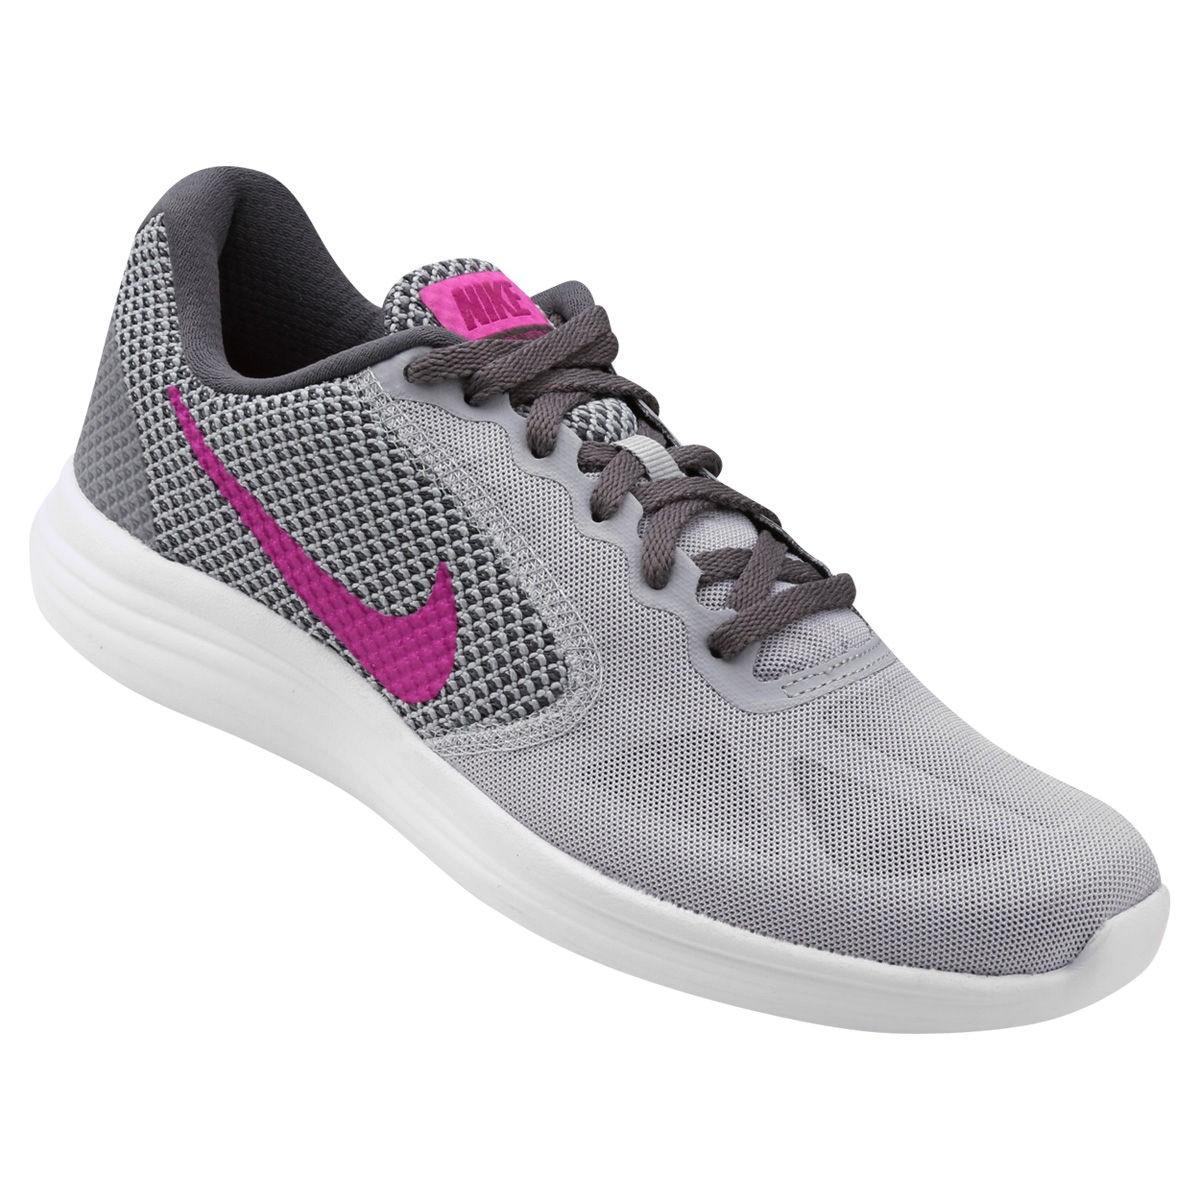 baf42e3009 Tênis Nike Revolution 3 Feminino - Cinza Rosa - Joinville Sportcenter